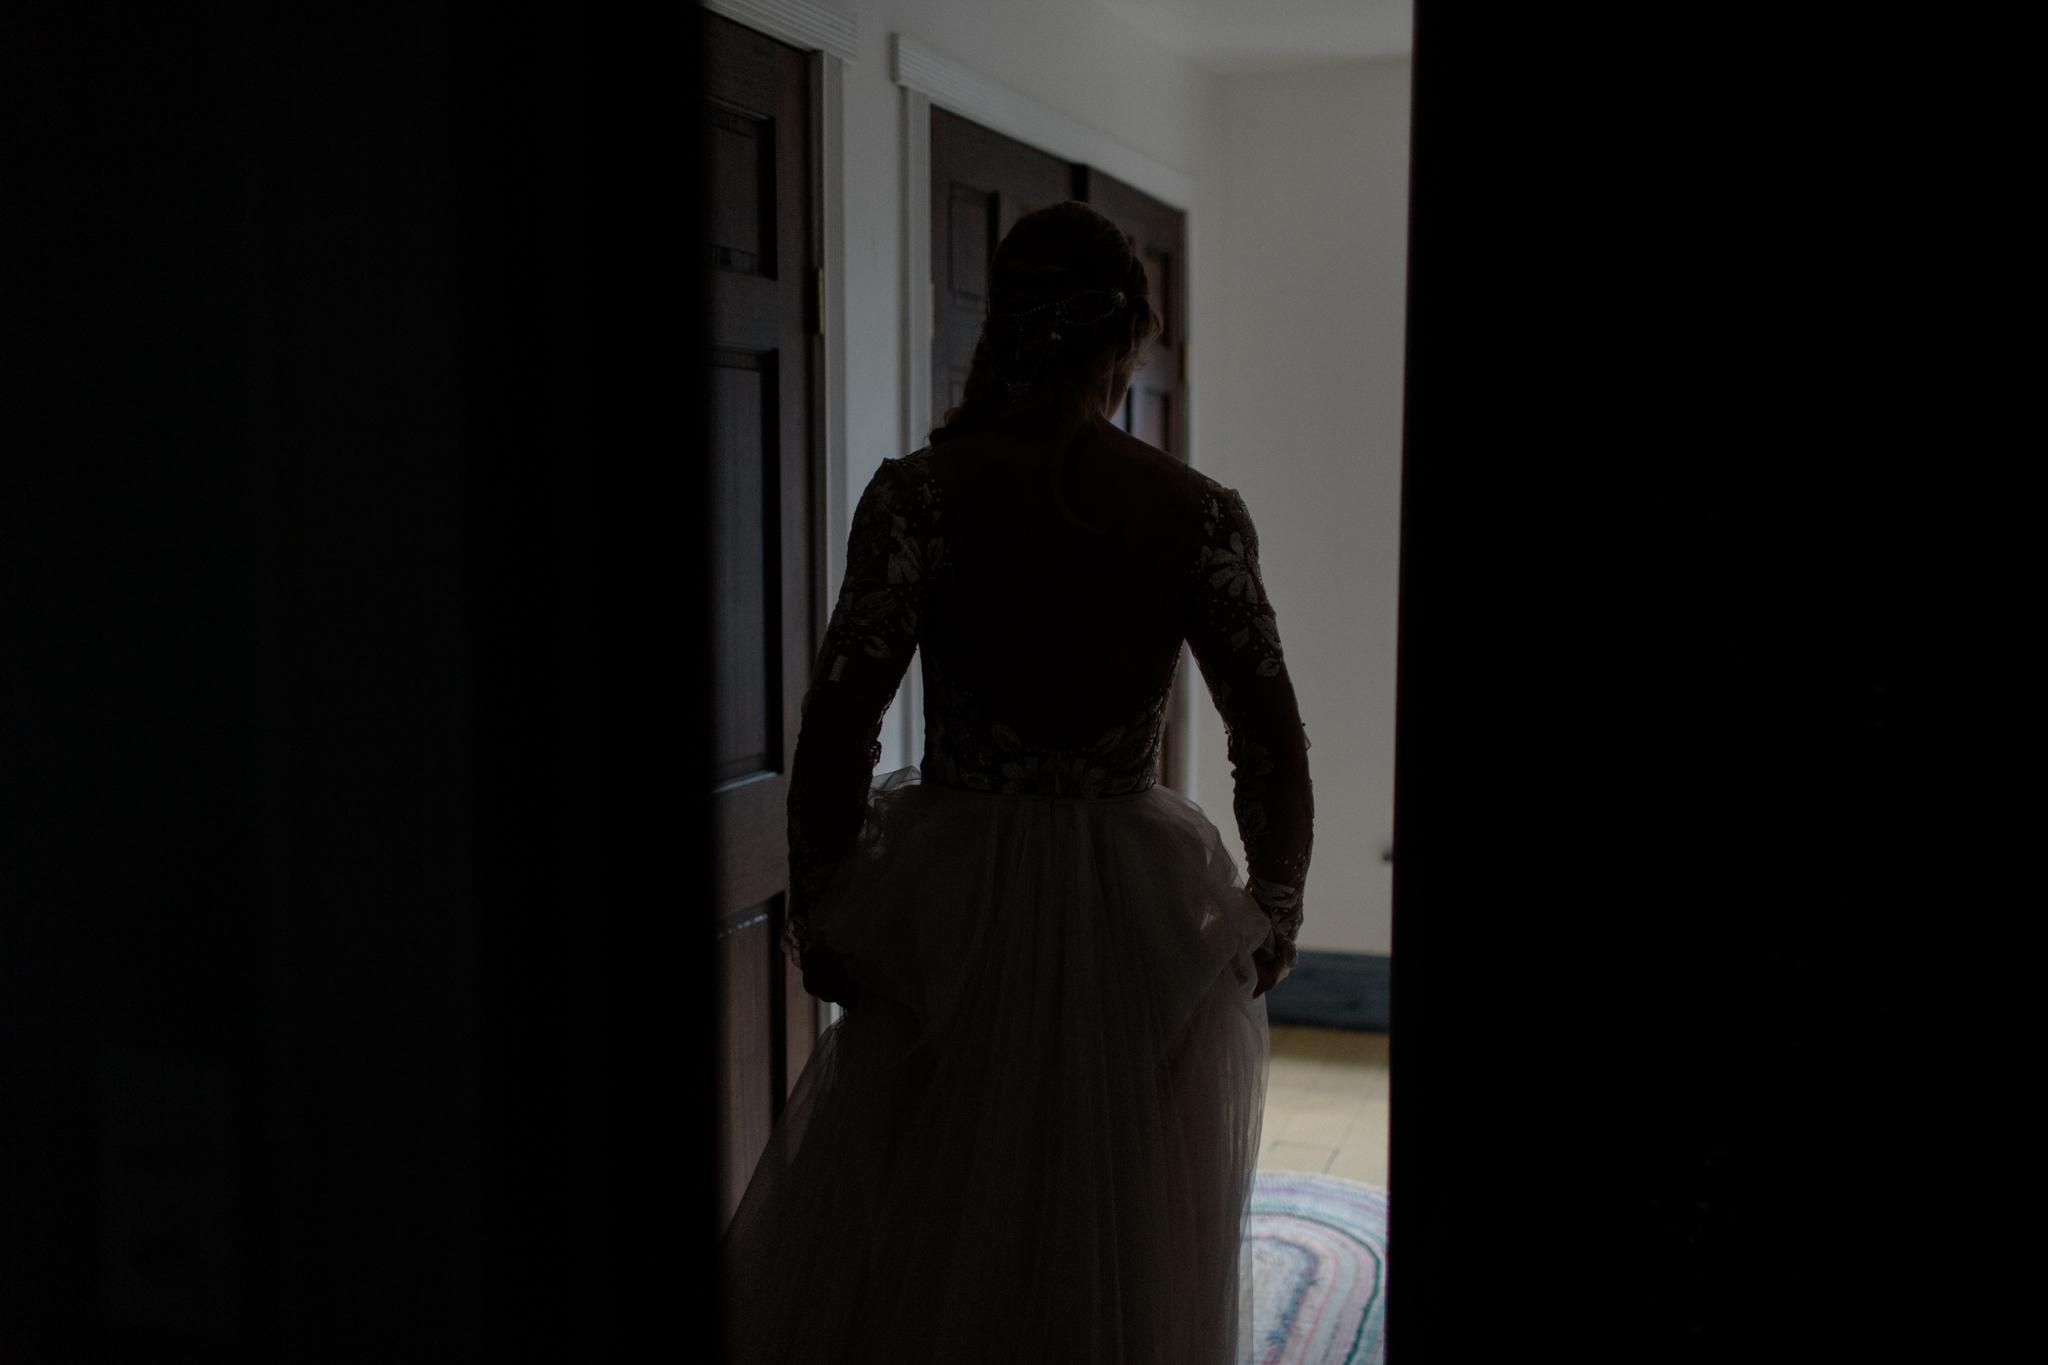 canyon run ranch wedding bohemian wedding photographer ohio bohemian wedding dayton ohio wedding photographer columbus ohio wedding photographer sarah rose hayley paige wedding dress